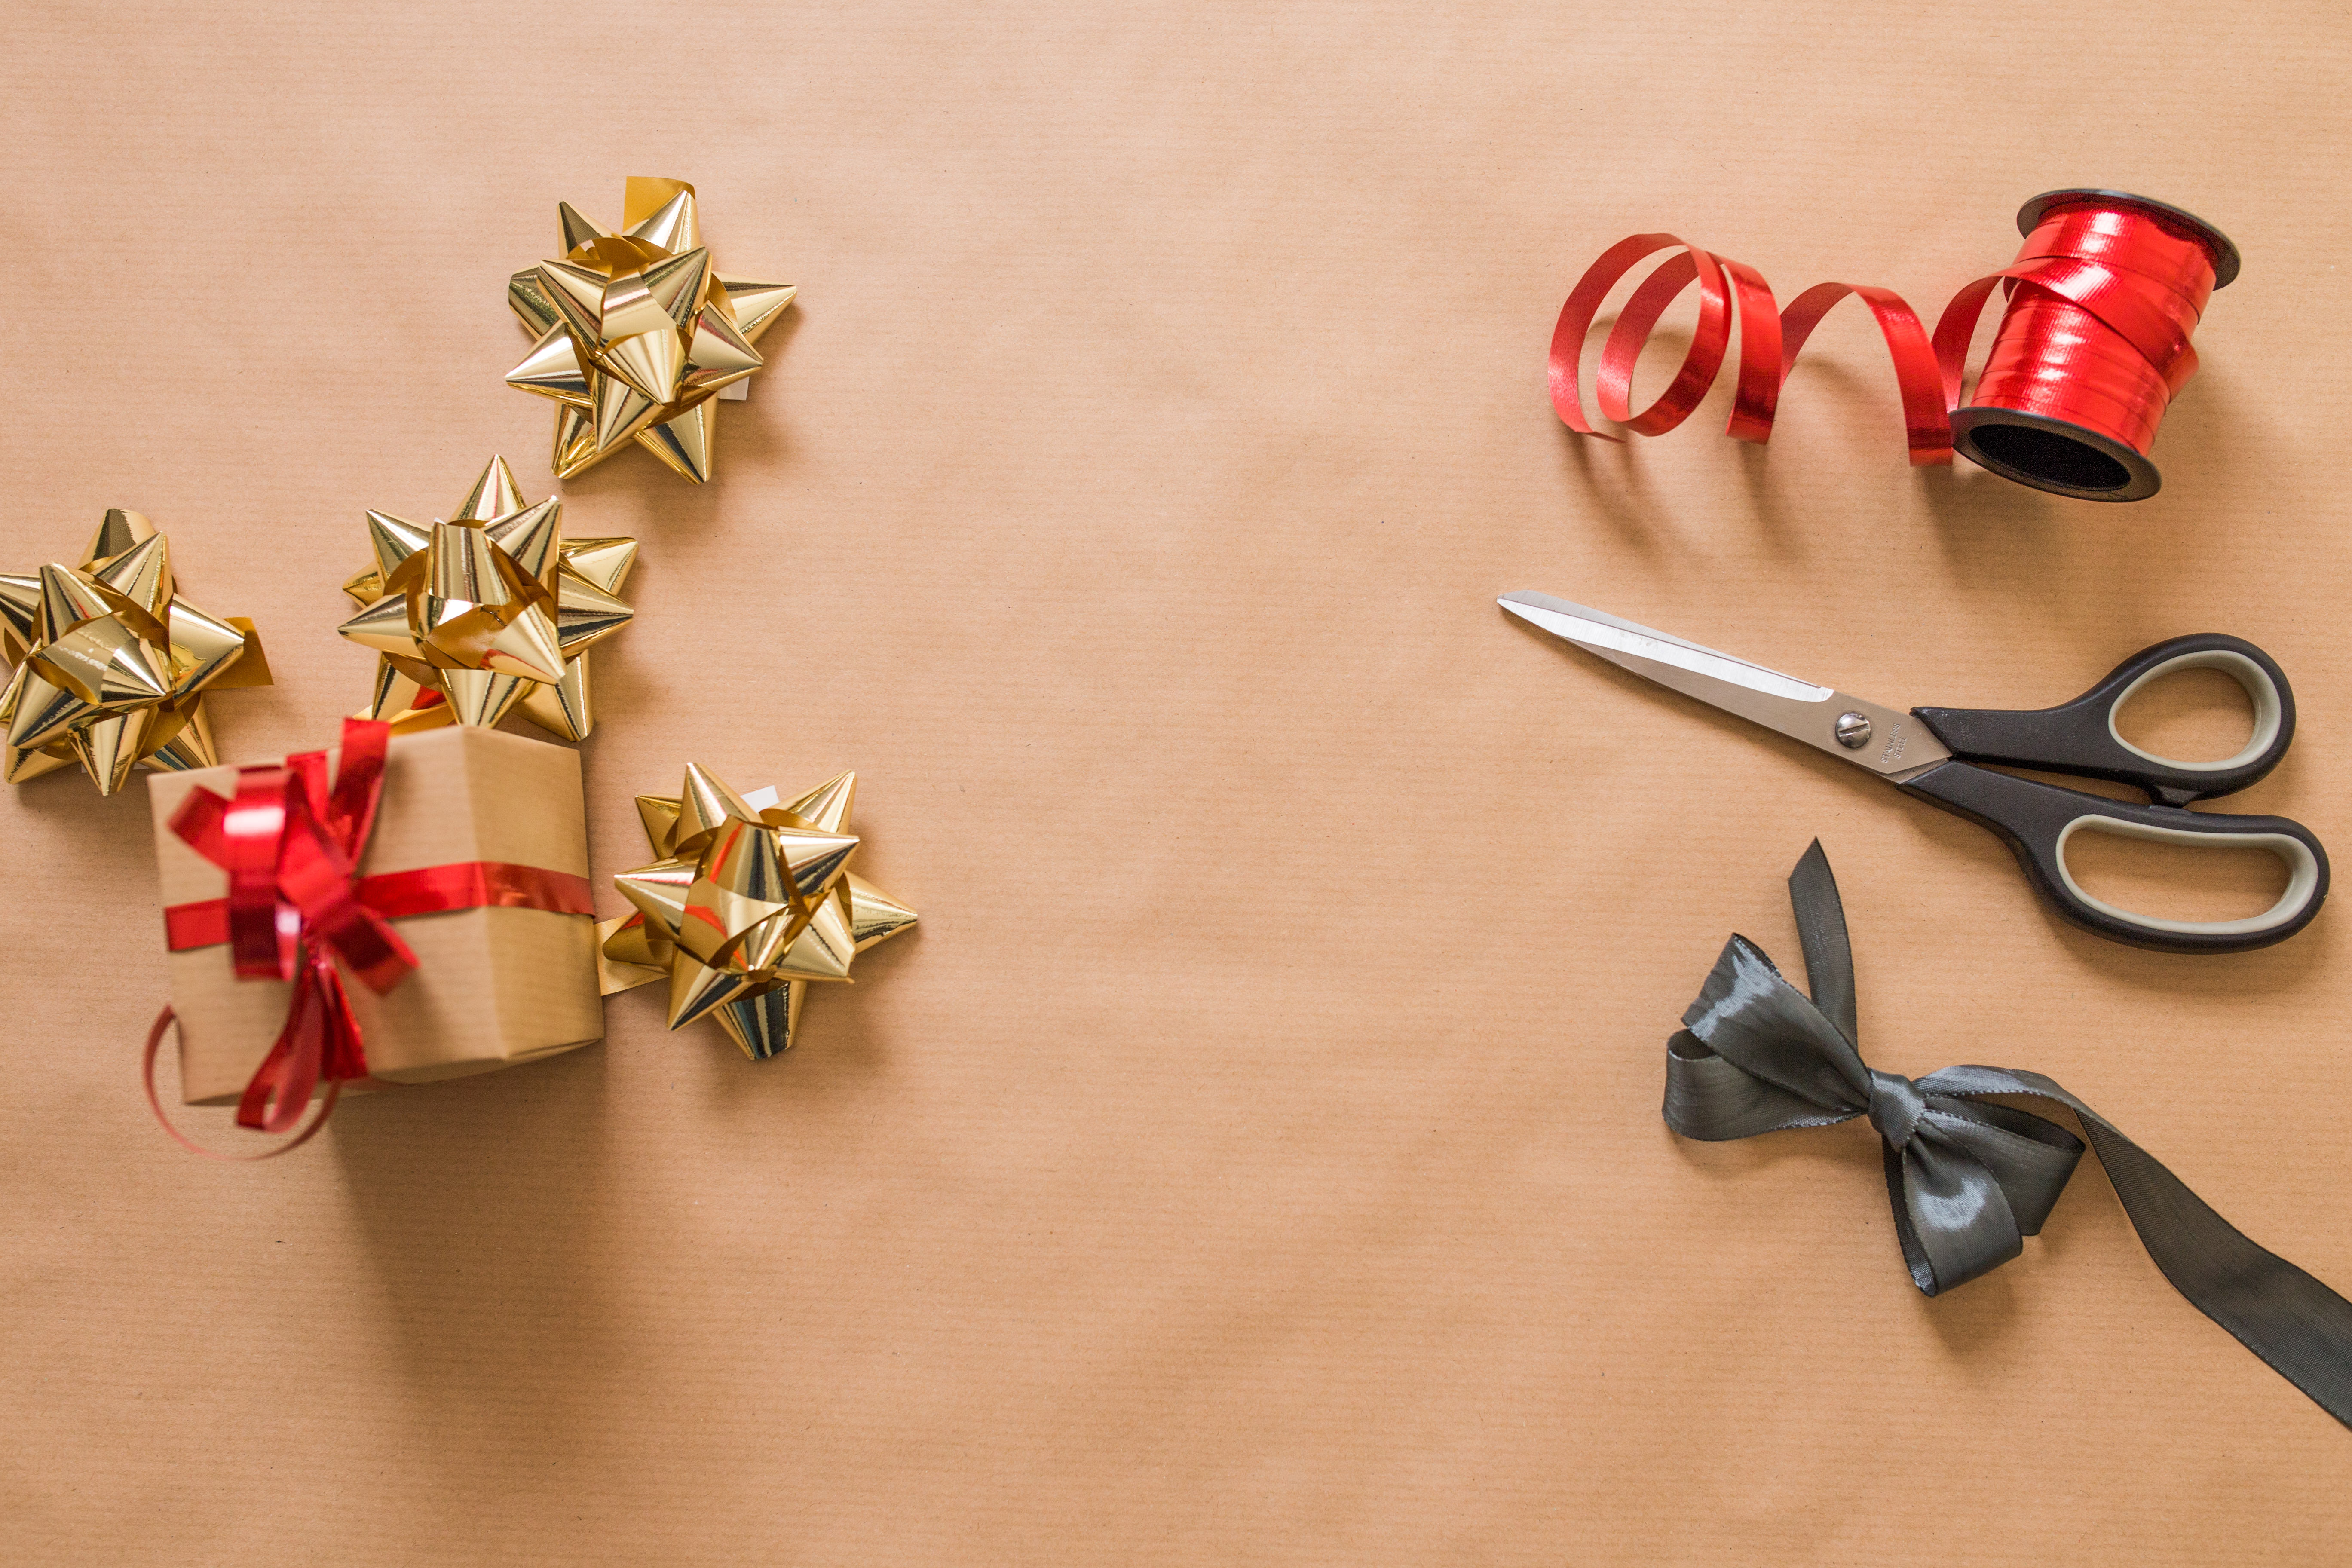 December Meeting: Christmas Crafts